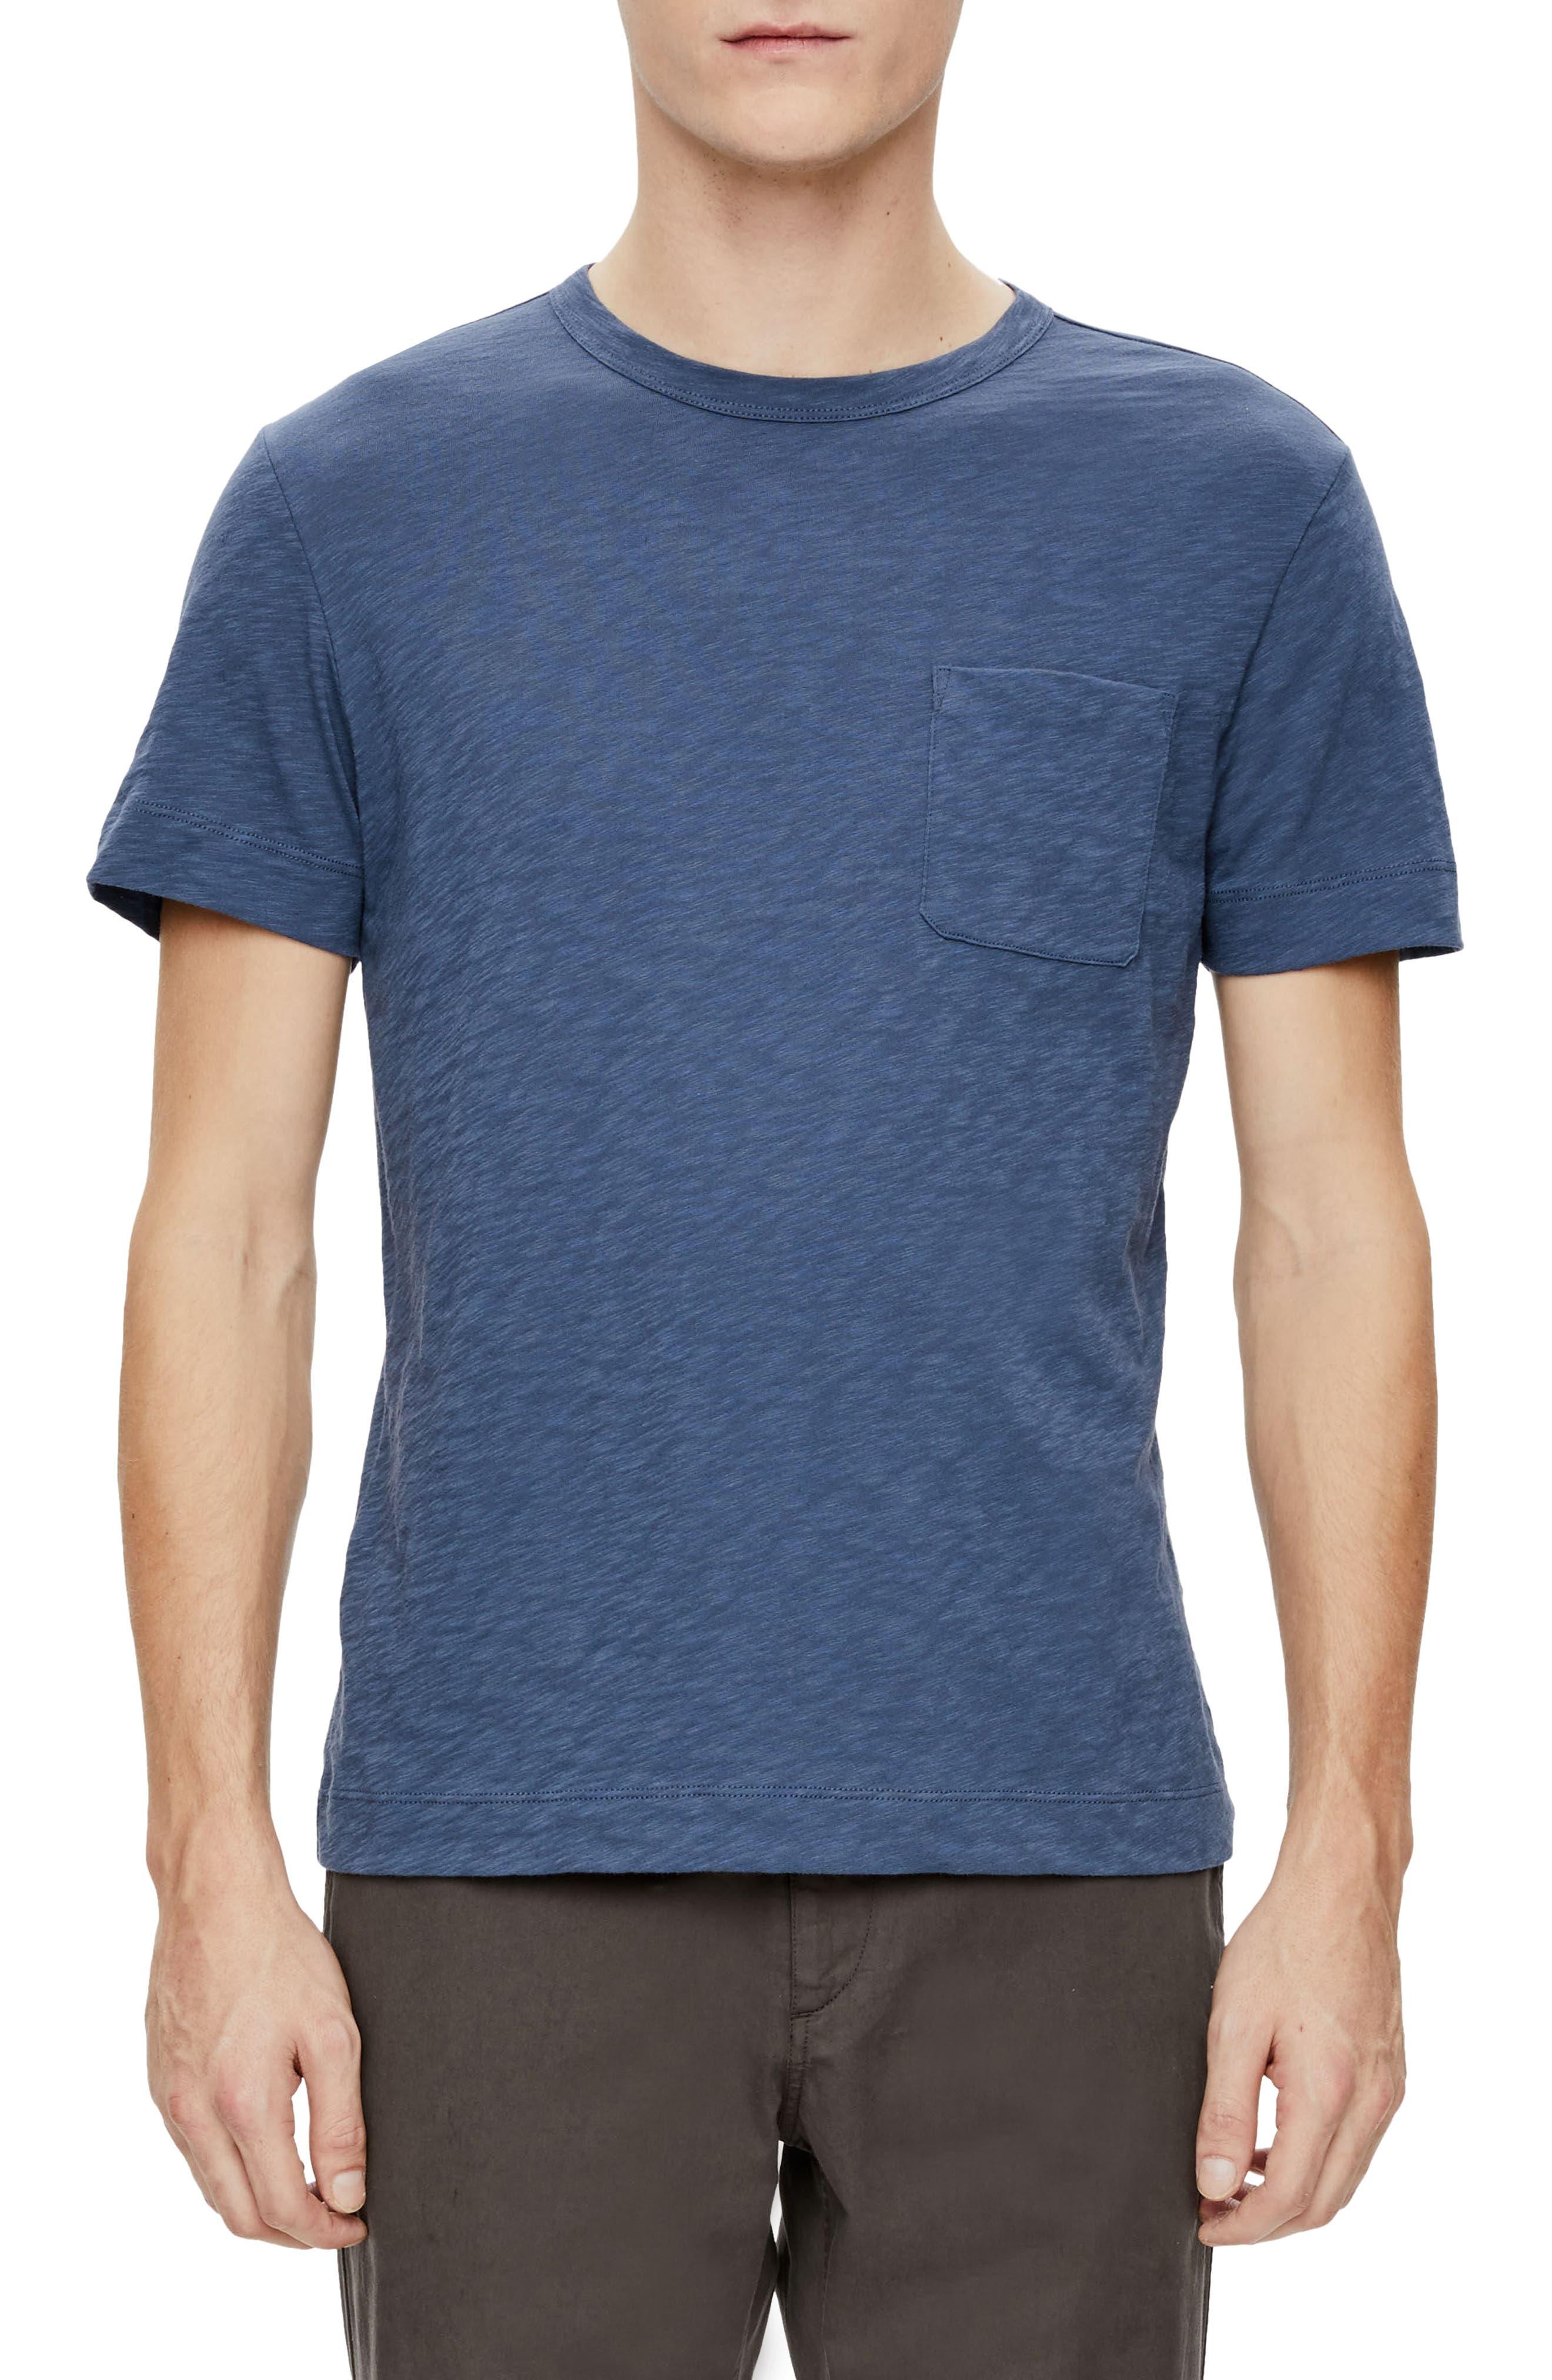 Gaskell Nebulous Slub Pocket T-Shirt,                         Main,                         color, 400